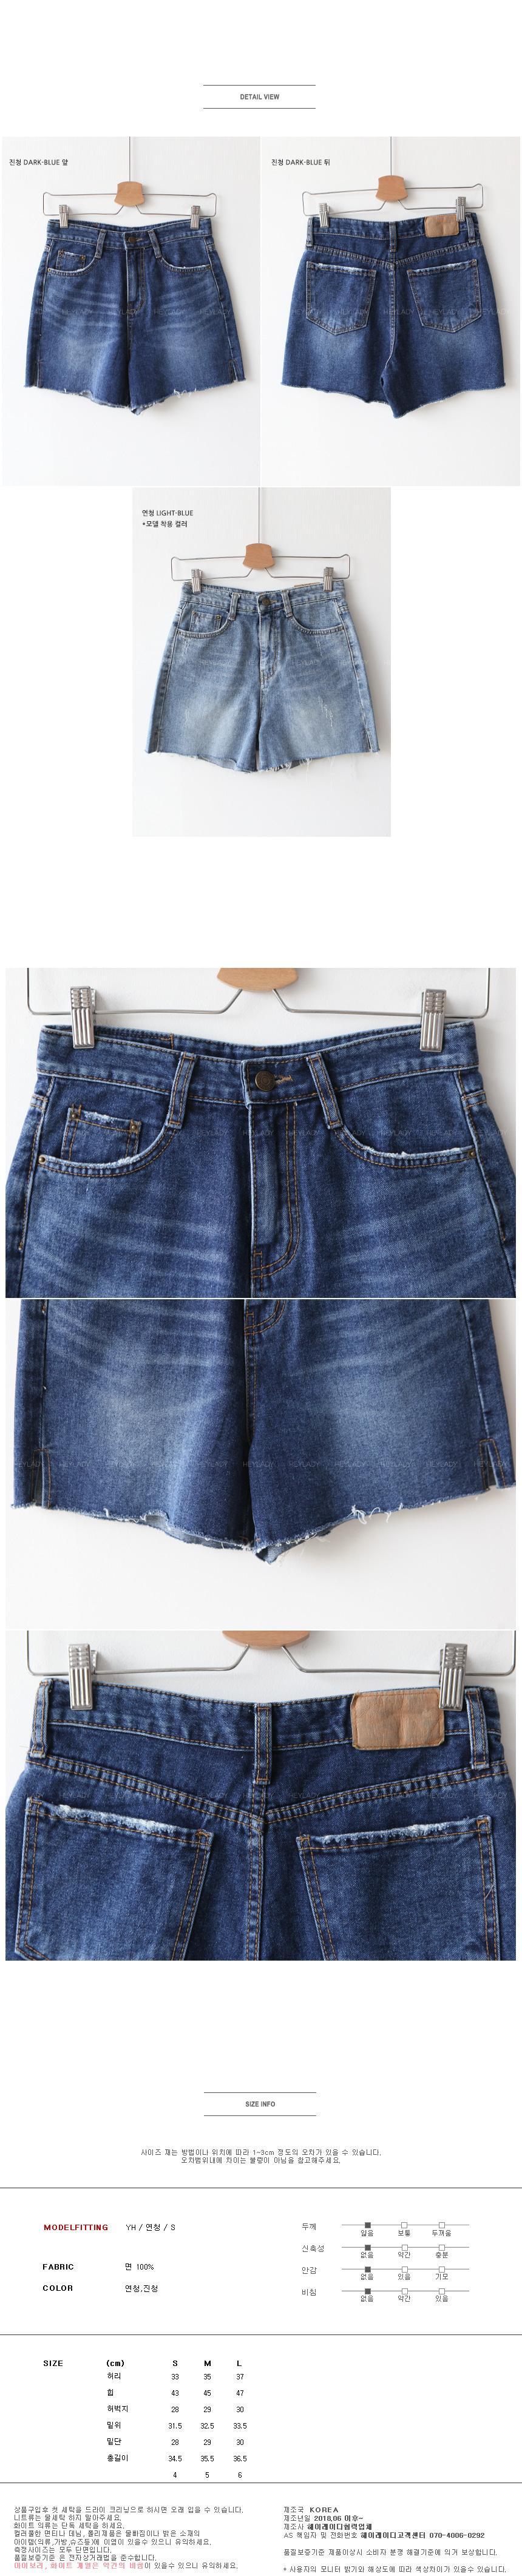 Langefe denim short pants